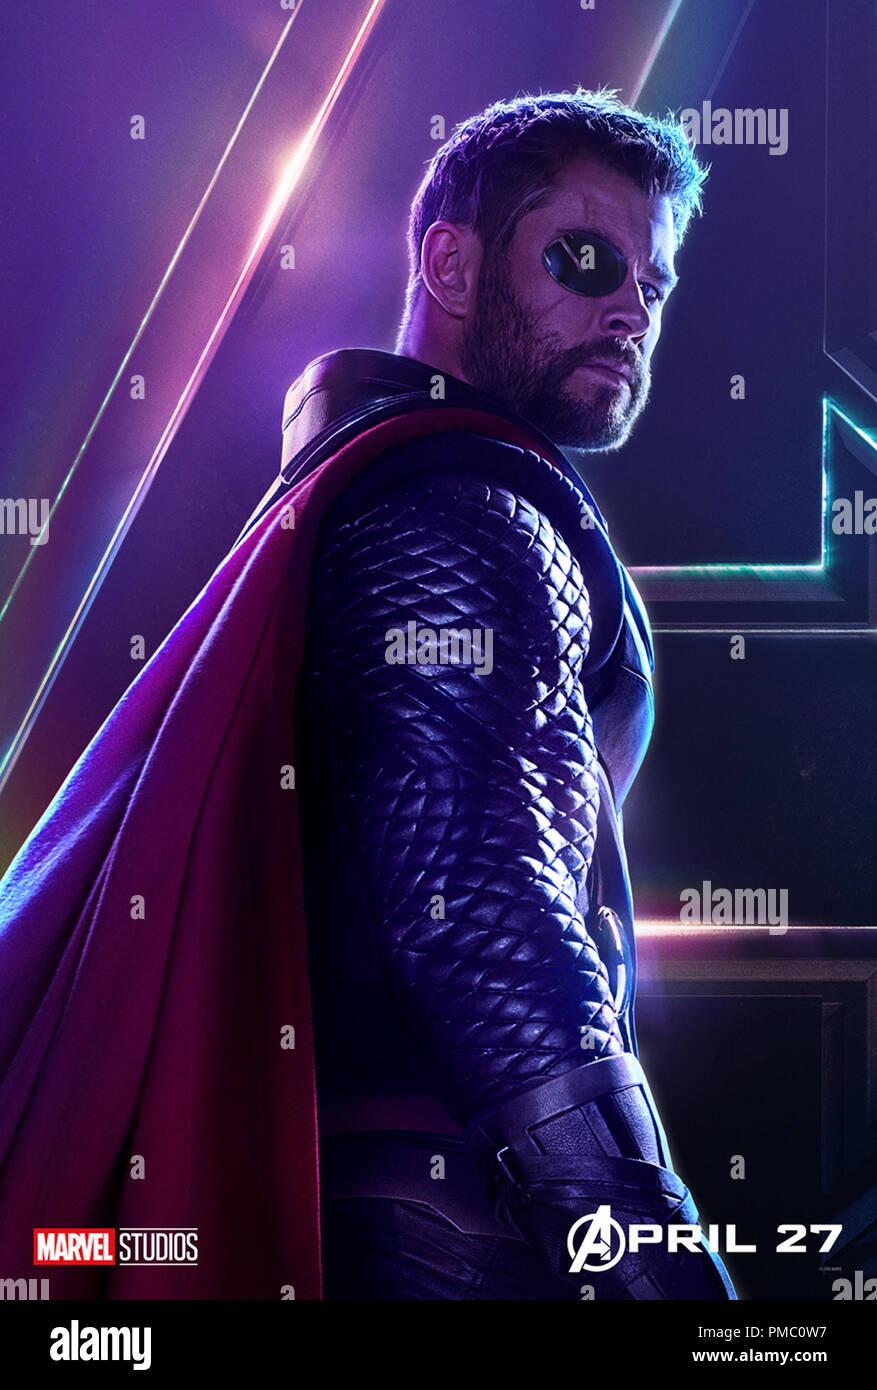 Avengers Infinity War 2018 Marvel Studios Poster Stock Photo Alamy